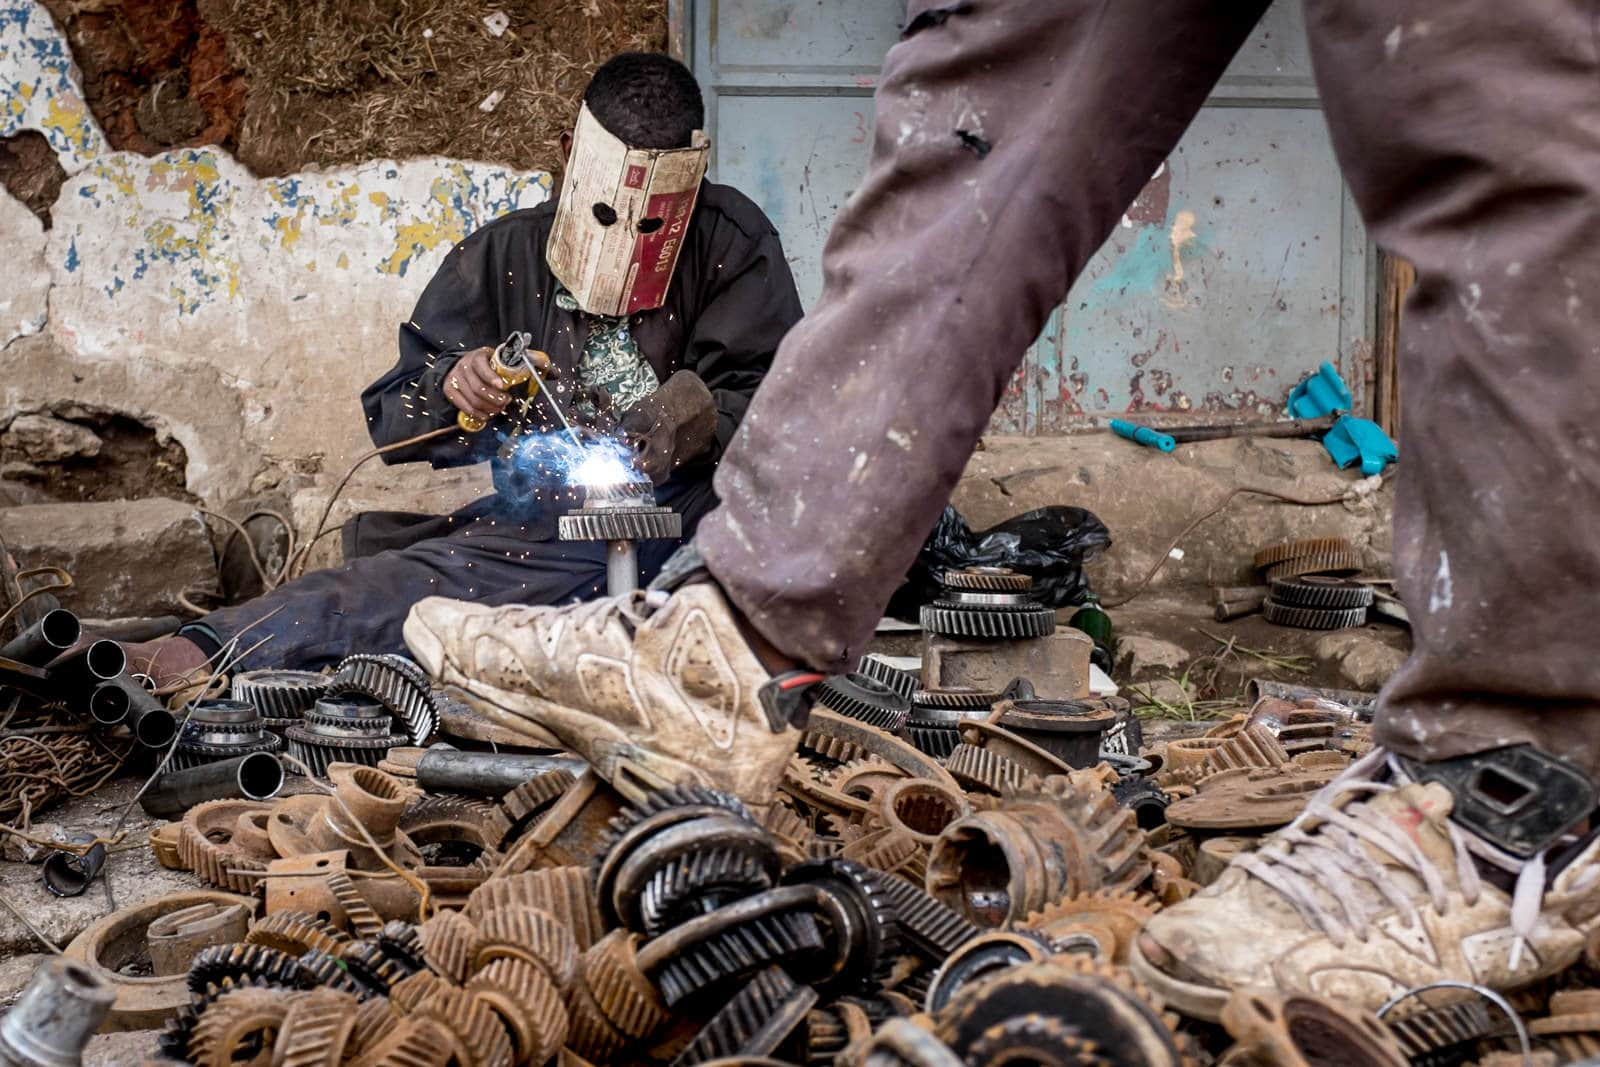 Man doing some DIY welding in Addis Merkato Ethiopia